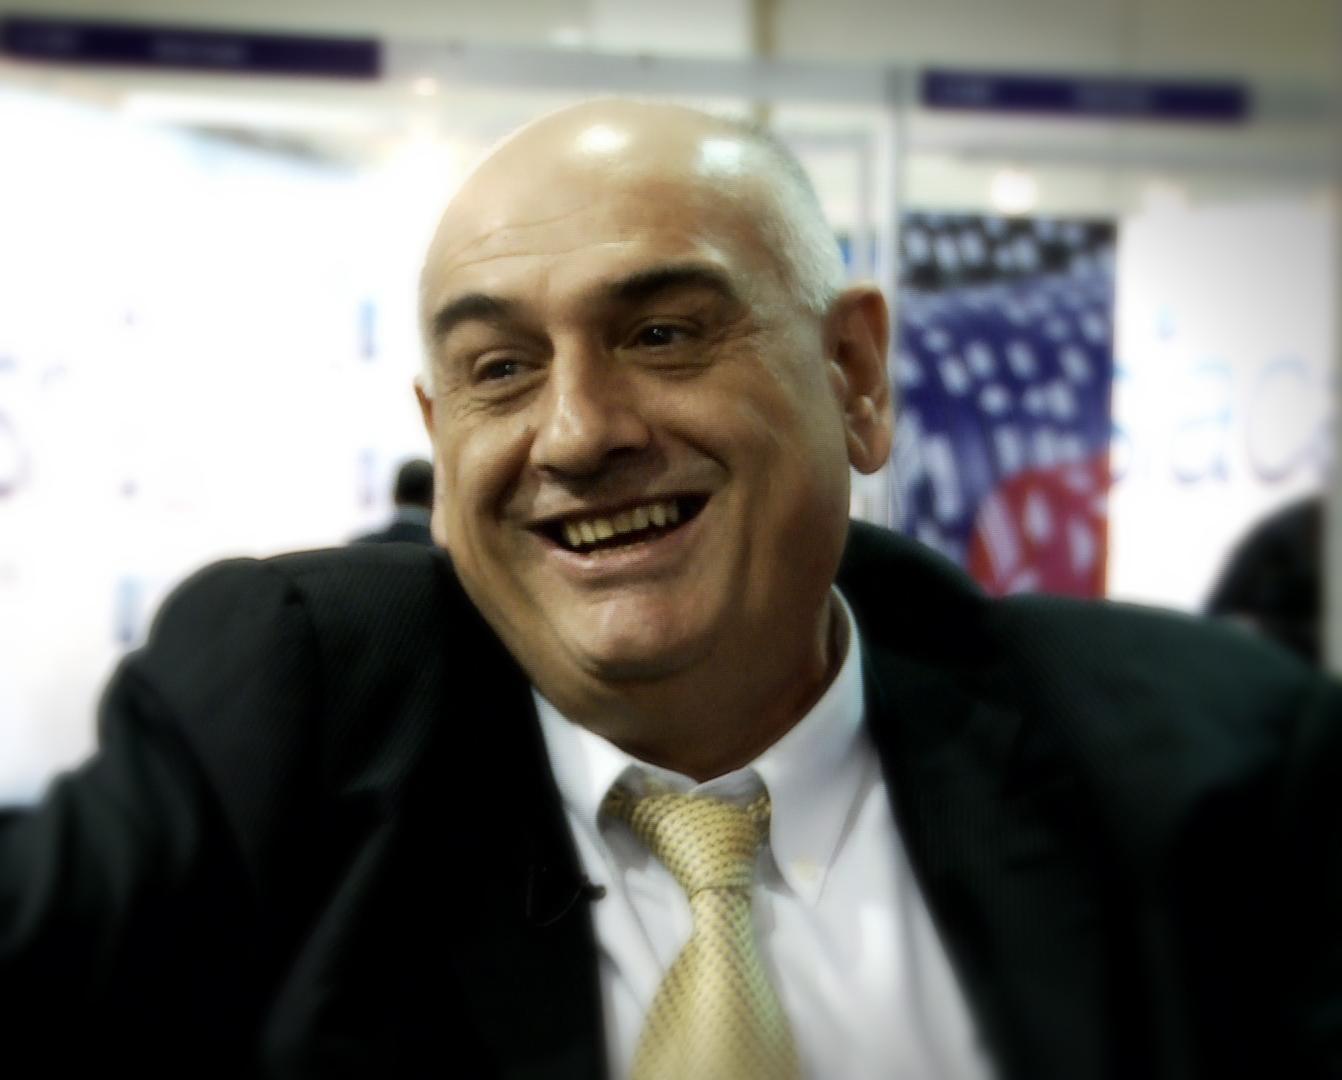 Joe Pisano CEO of Jade Gaming